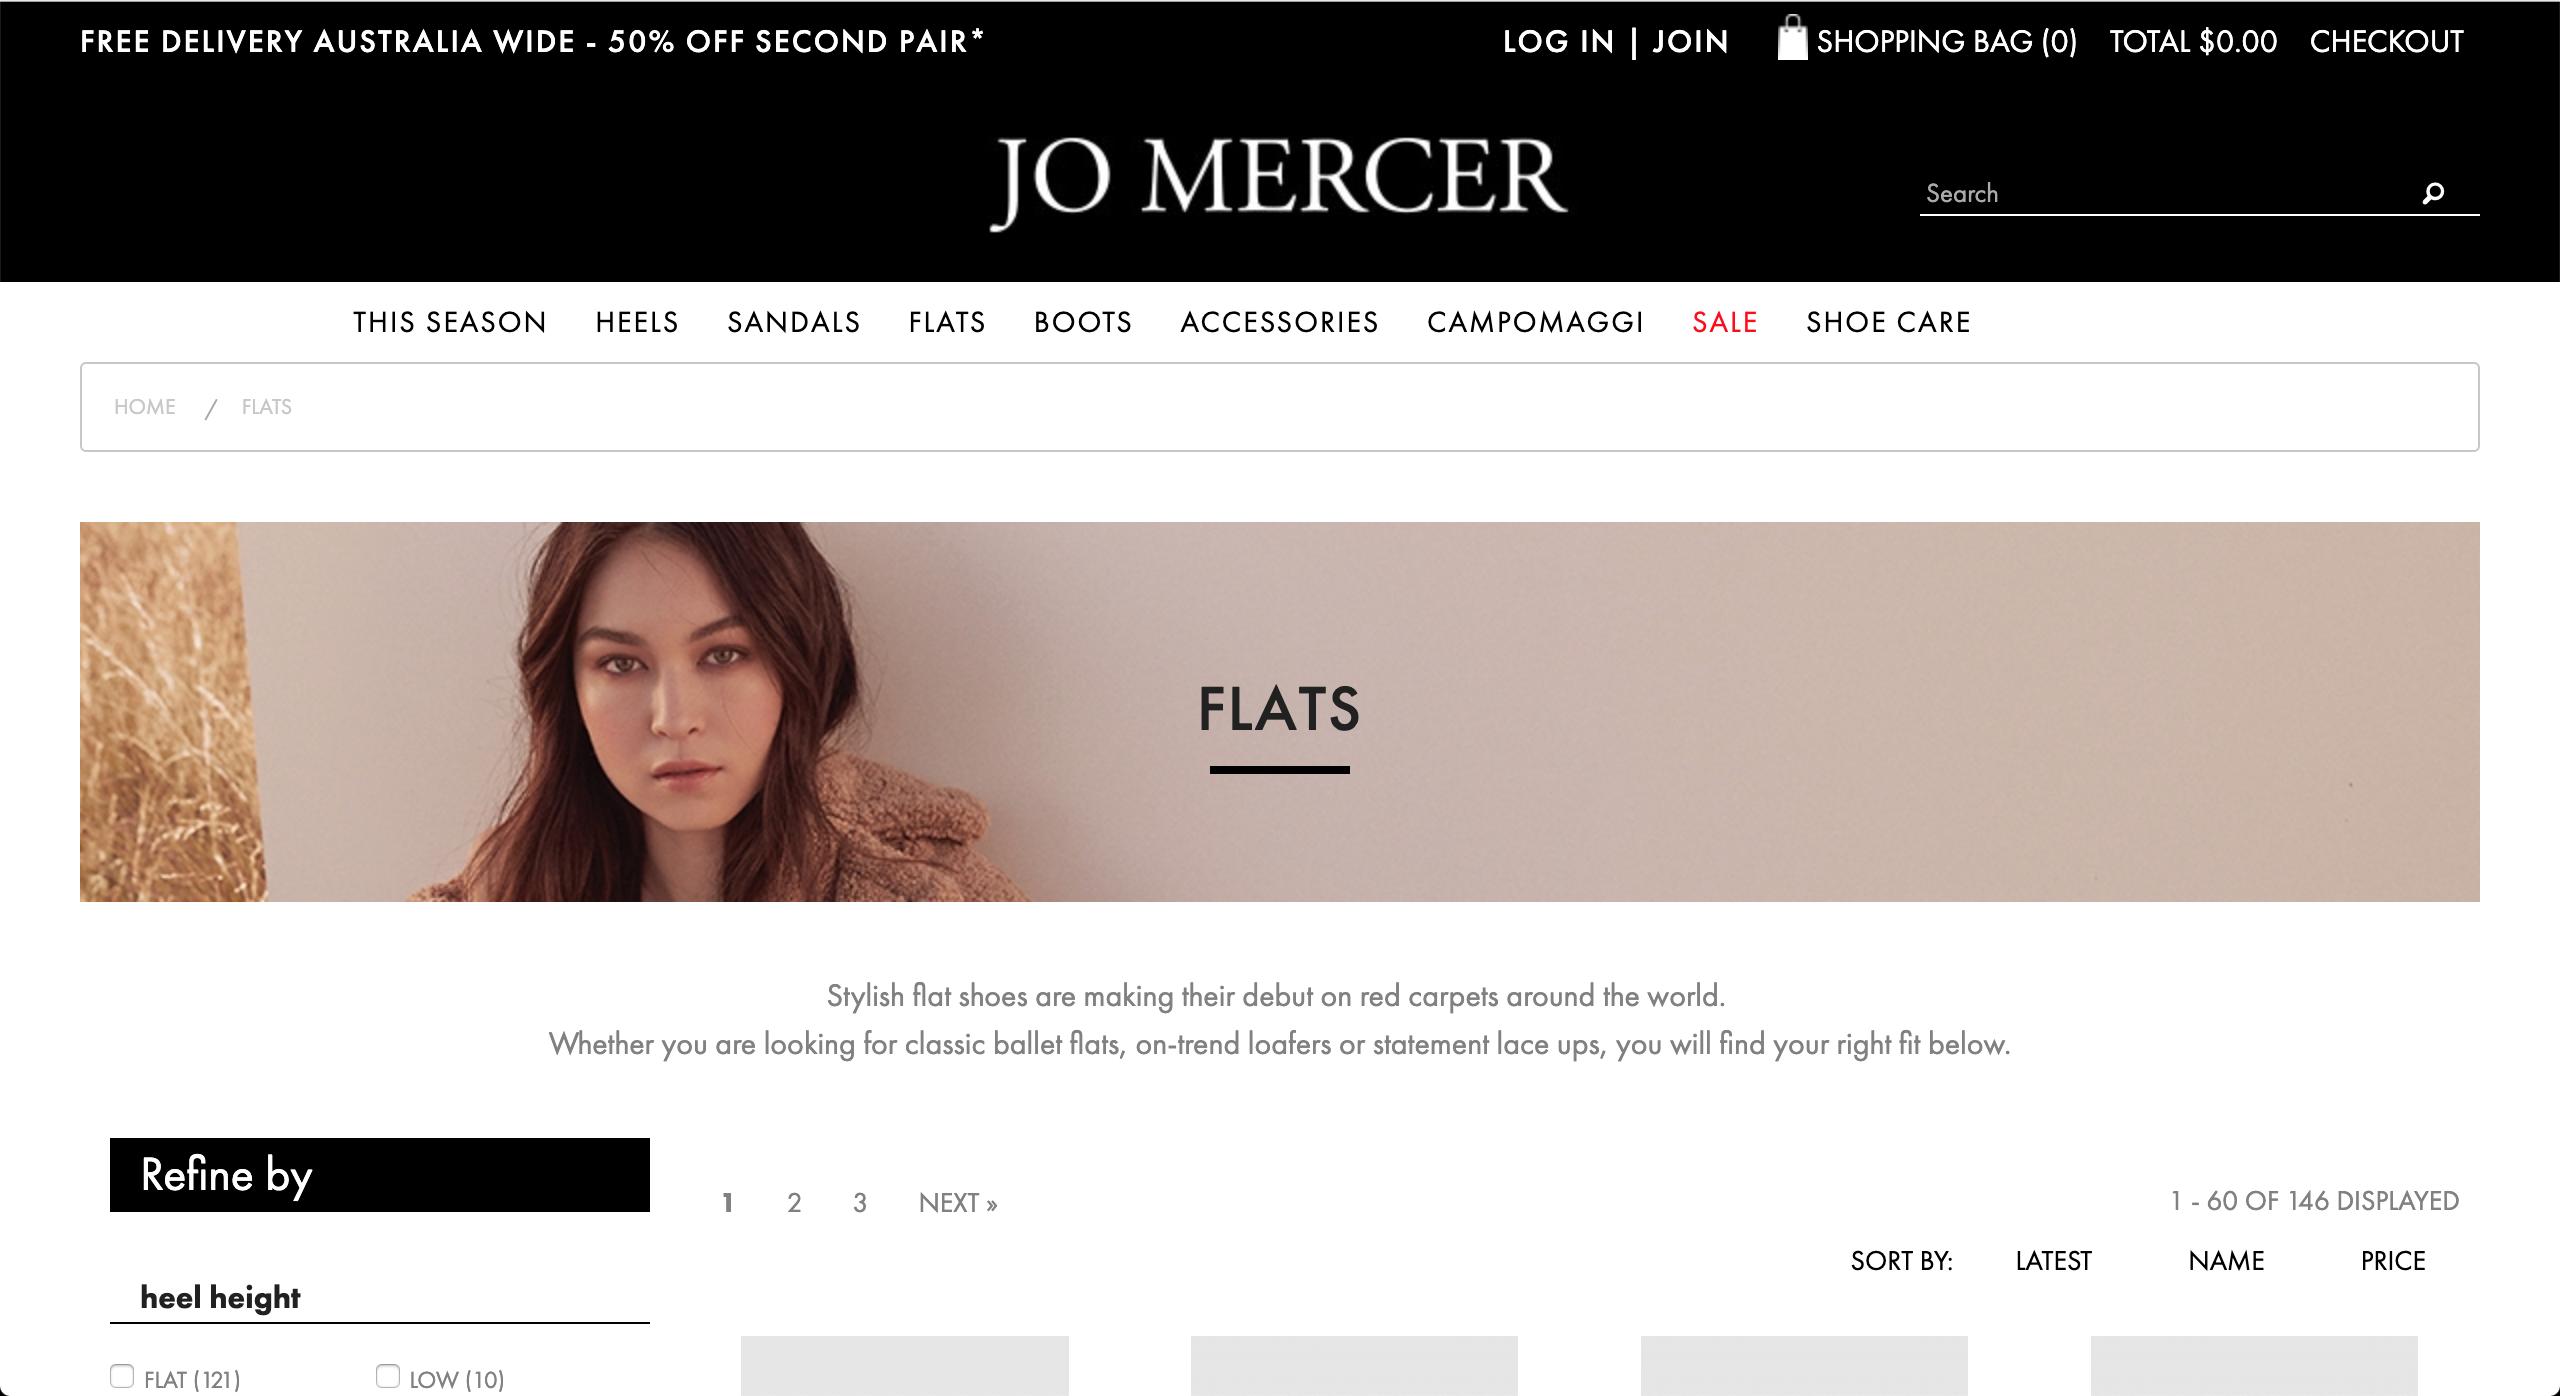 Jo Mercer Flats